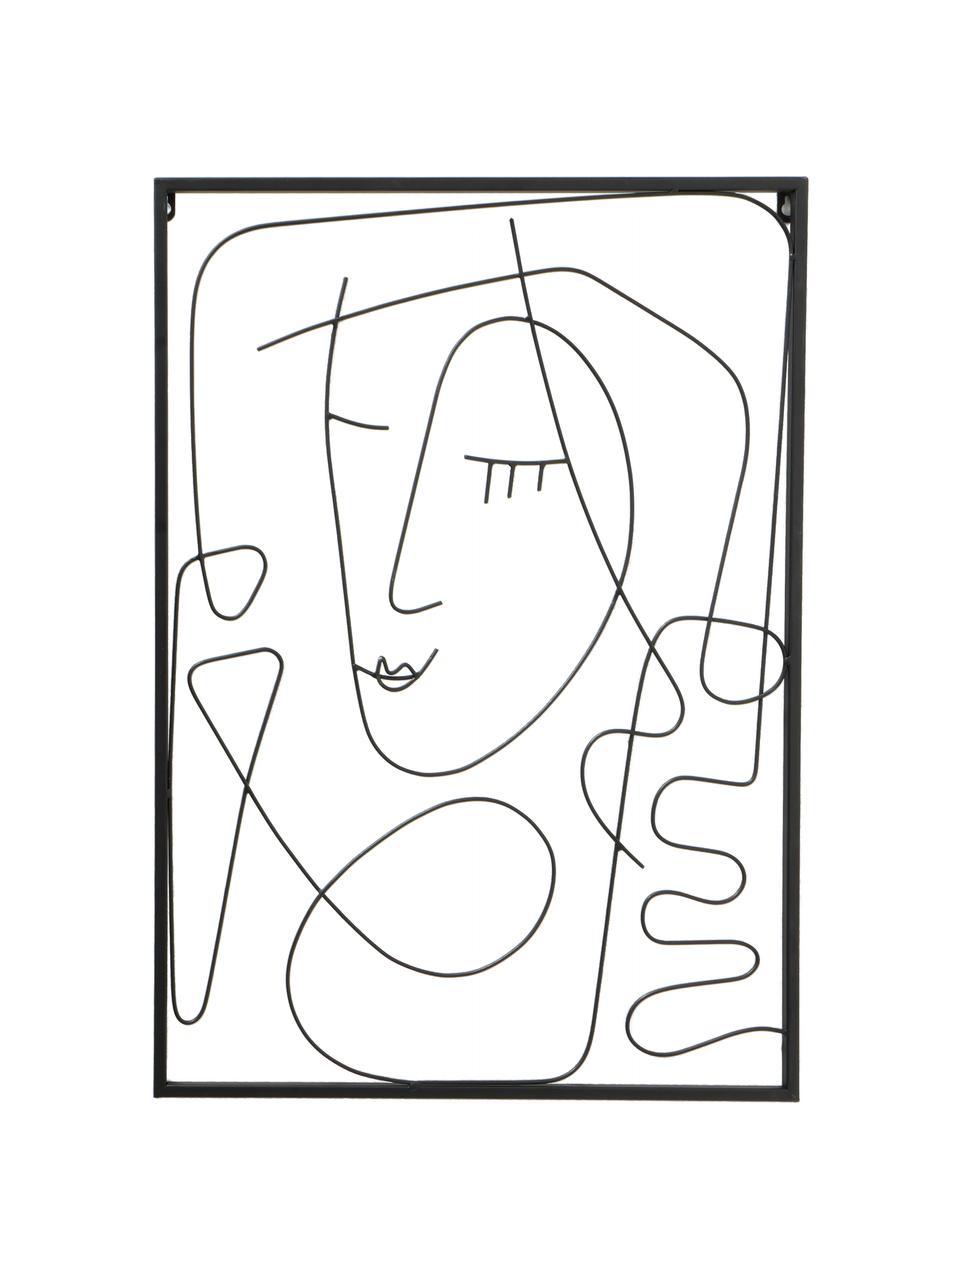 Wandobjekt-Set Pica, 2-tlg., Metall, lackiert, Schwarz, 49 x 69 cm